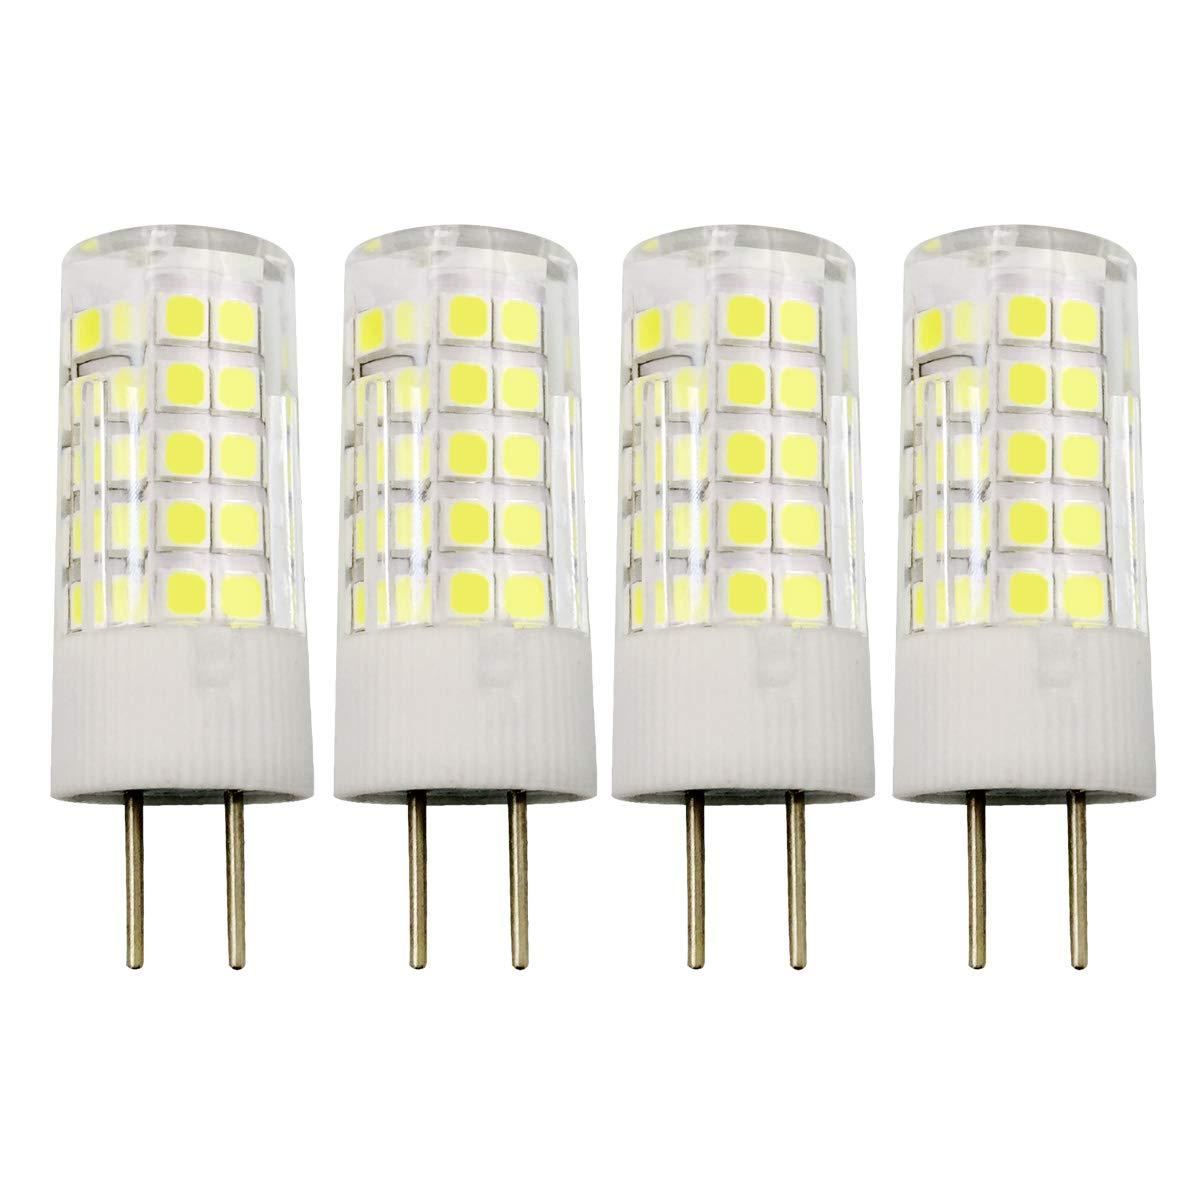 4W JC GY6.35 LED電球 120V 35W T4 ハロゲン GY6.35 ベース電球相当 昼光色 4個パック B07MN1B7JQ